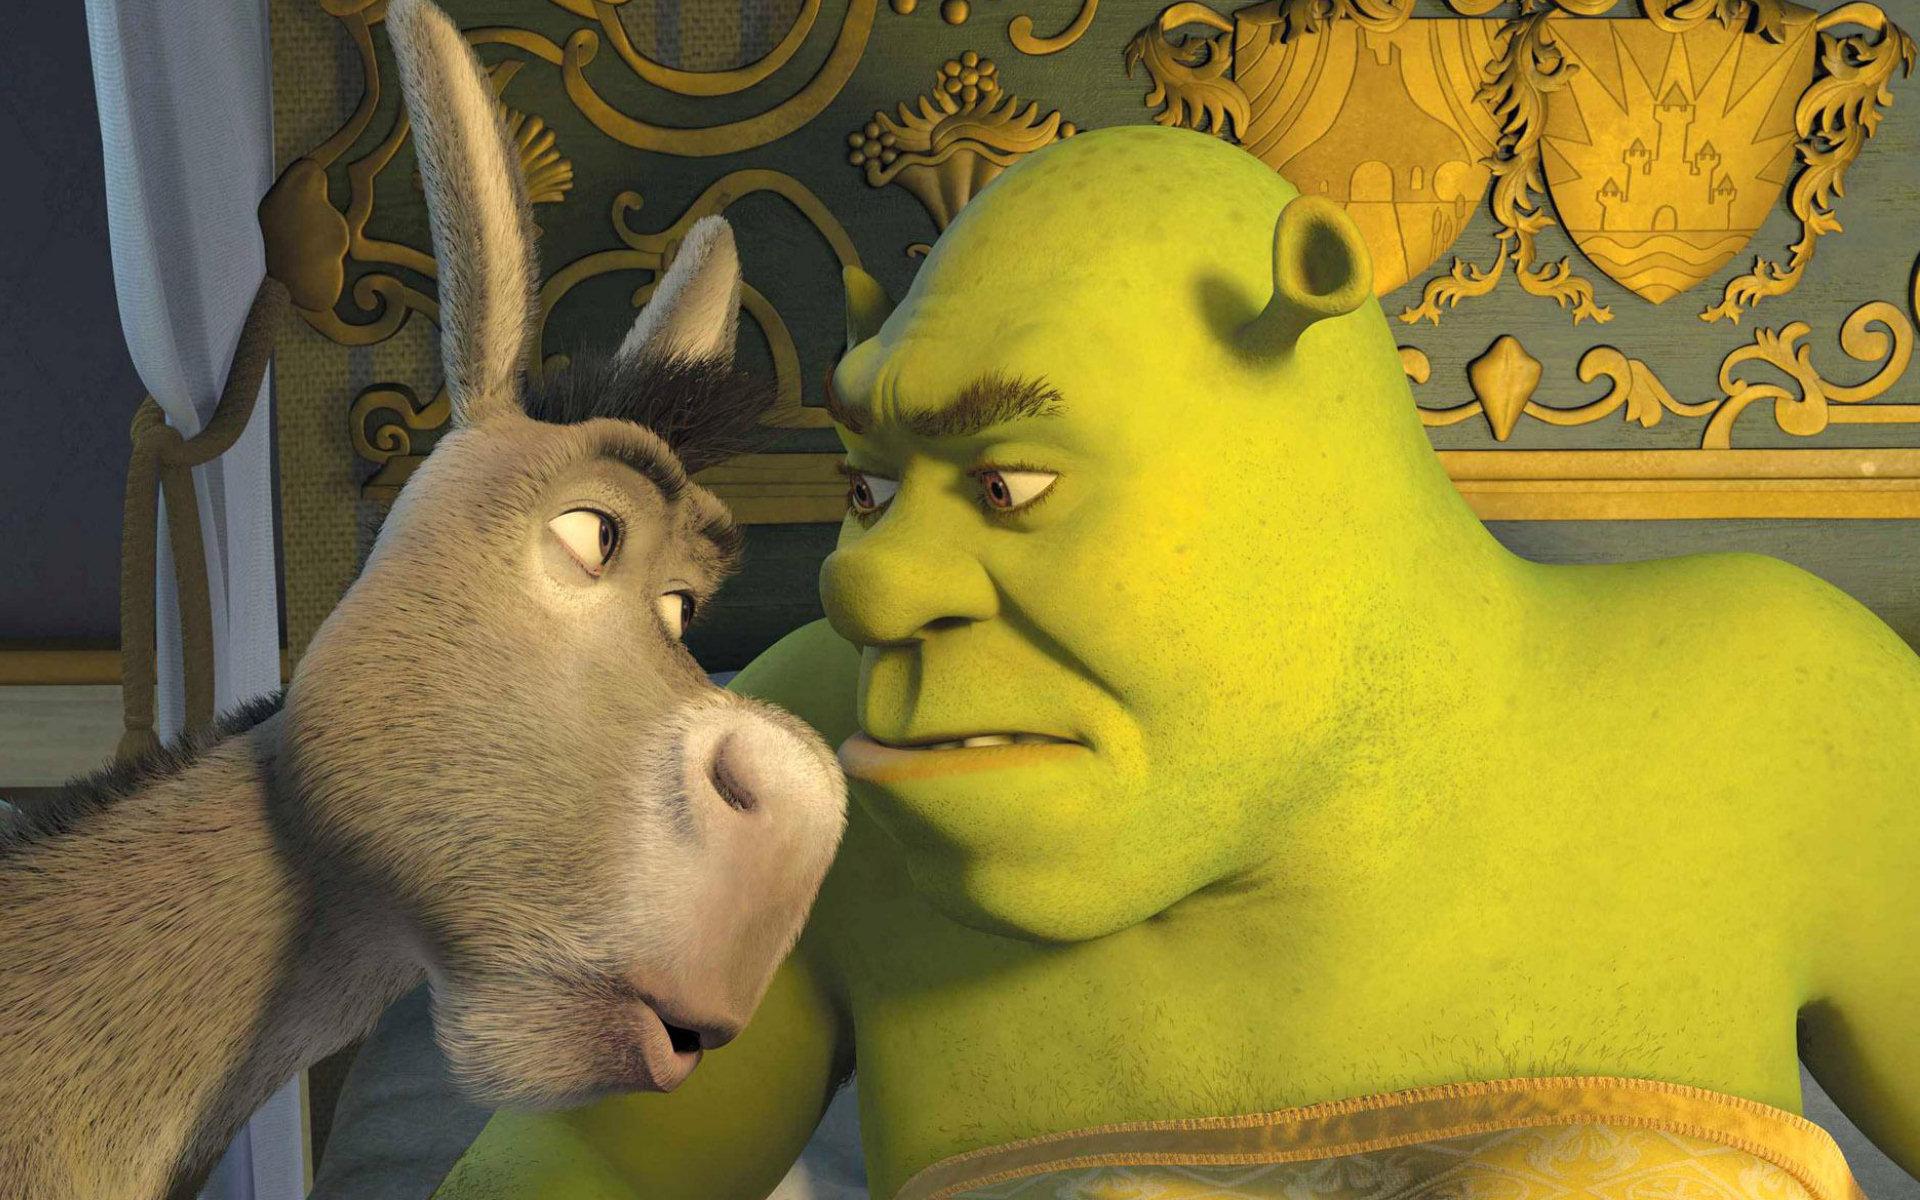 21+ Shrek Wallpaper Ipad Images